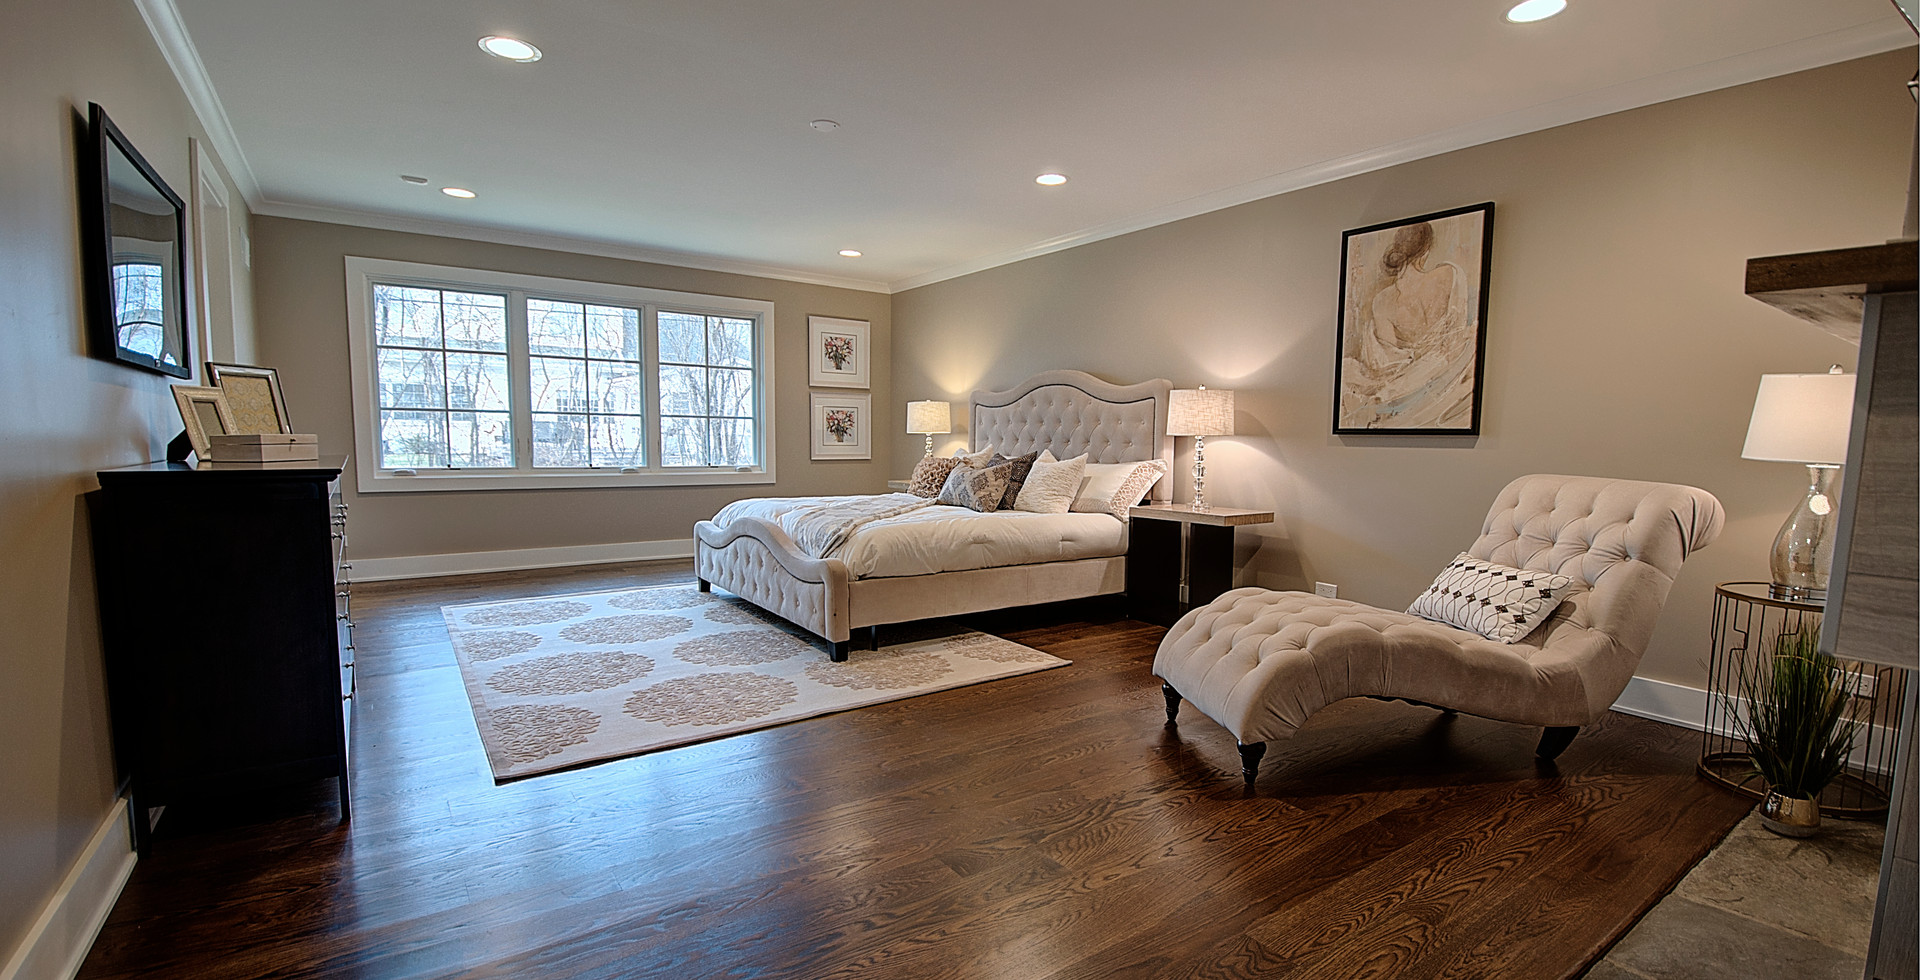 Bedroom in Park Ridge designed by MRM Home Design.jpg